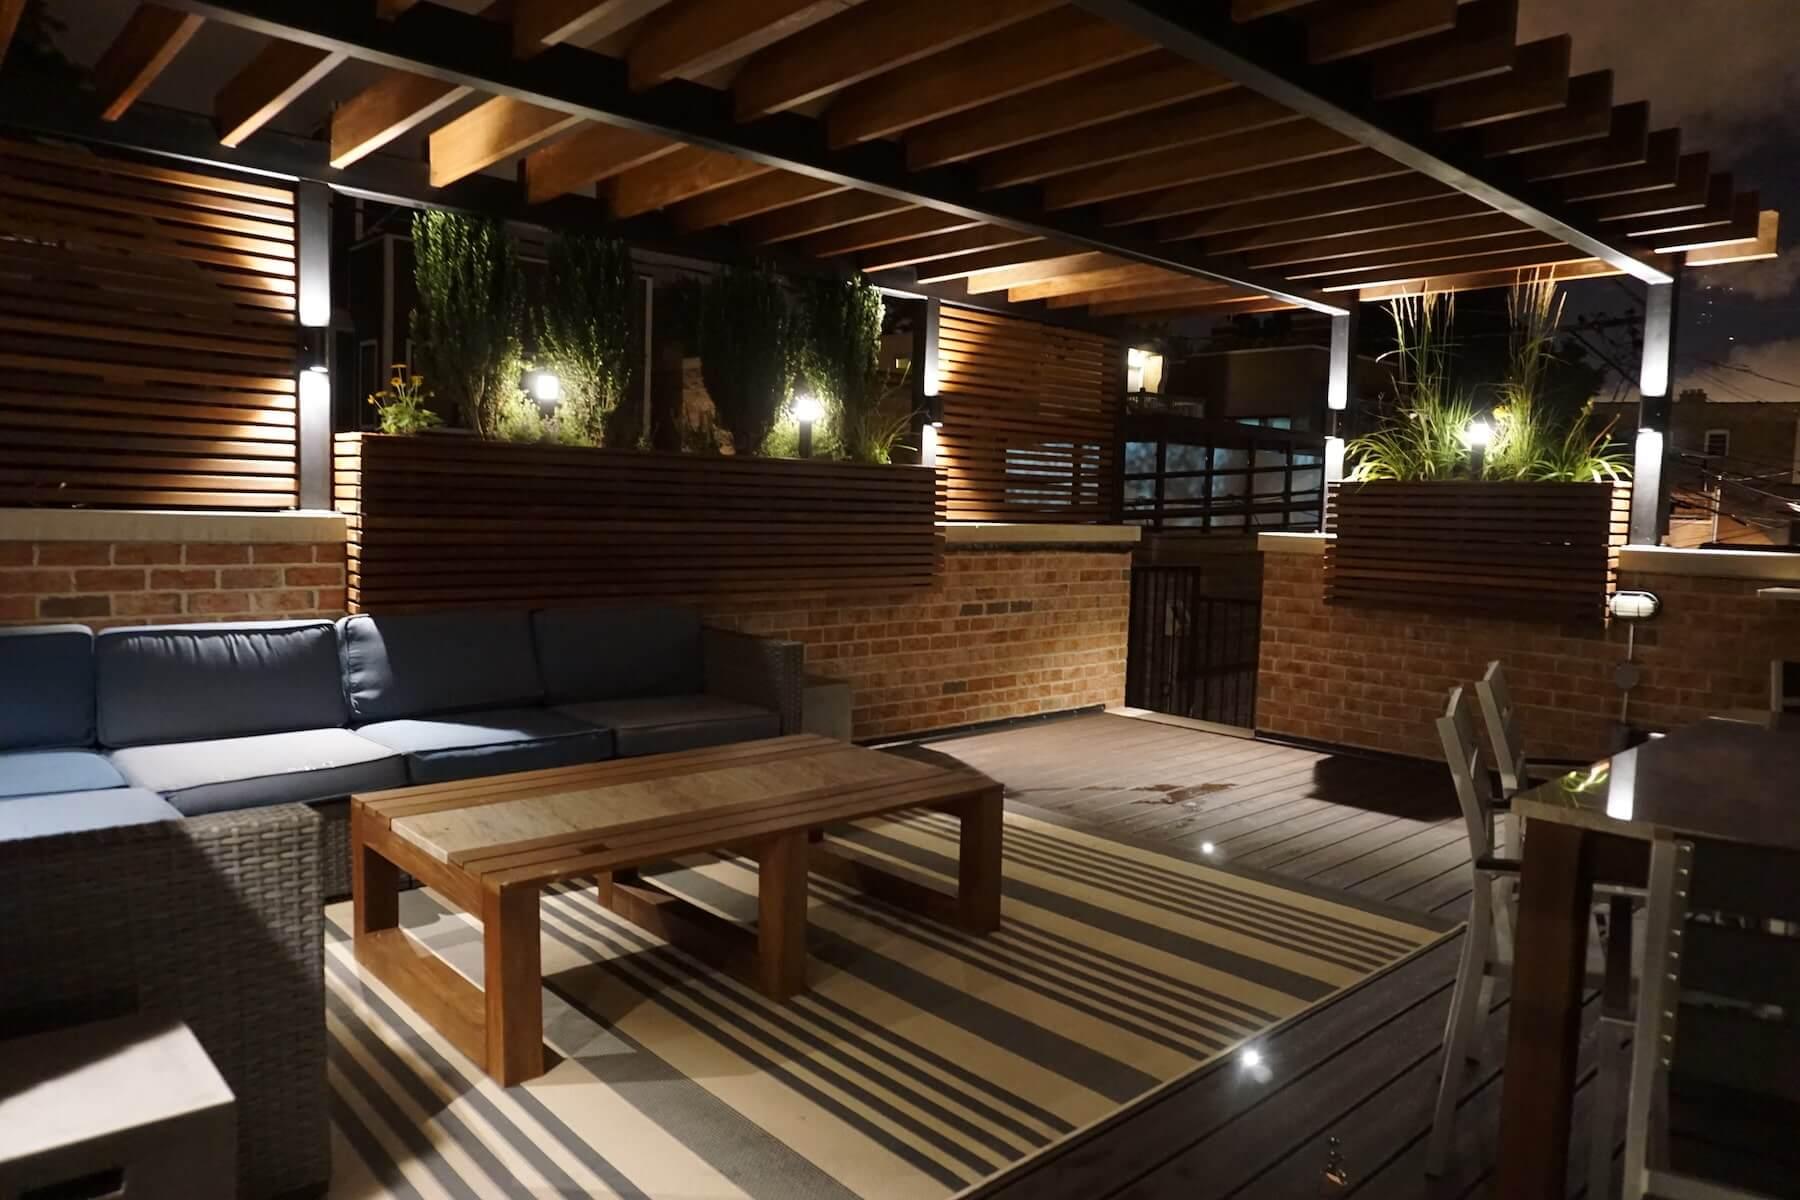 Rooftop Deck With Pergola And Landscape Lighting Denver CO